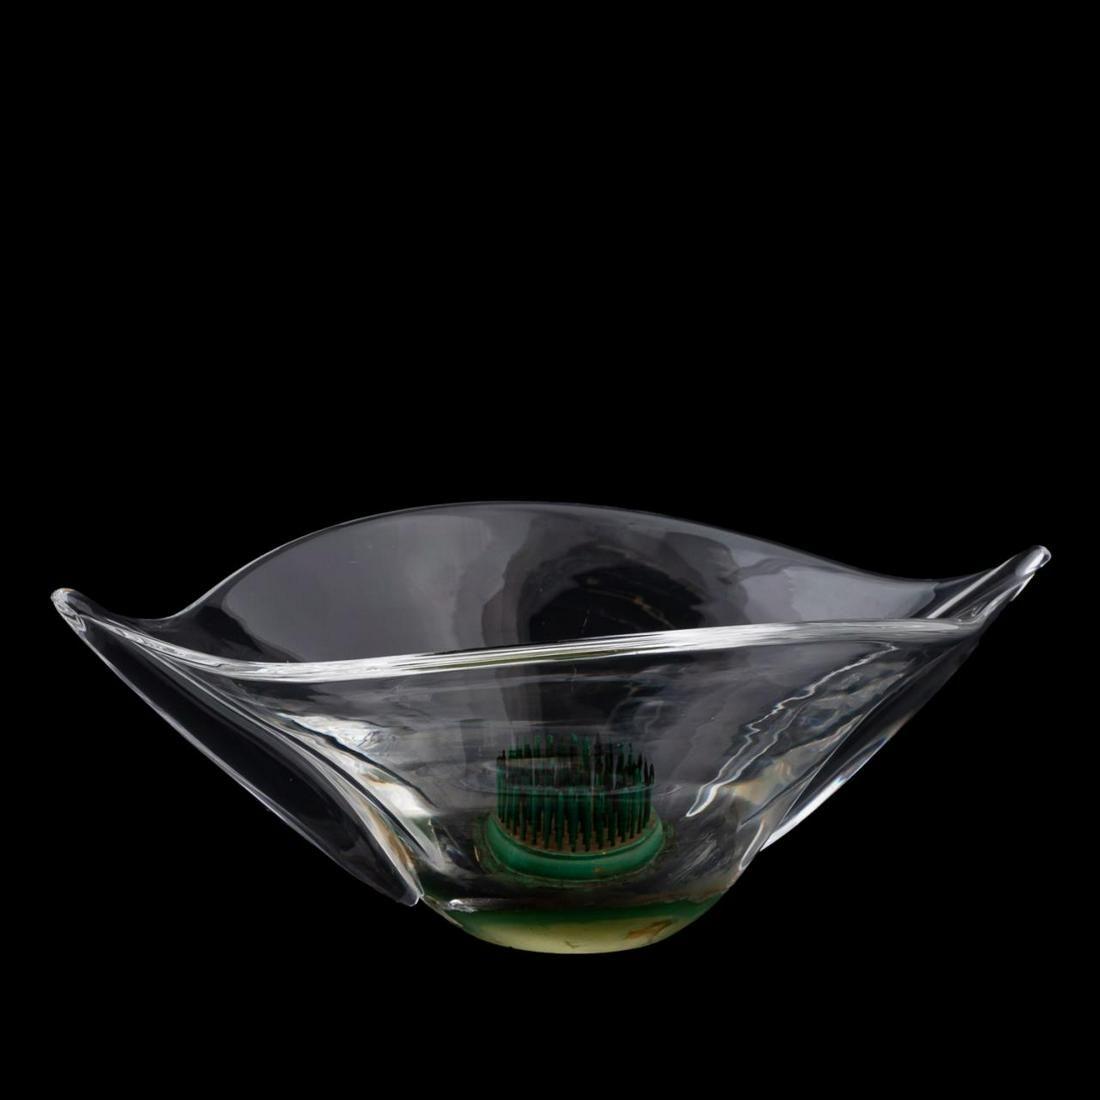 STEUBEN GLASS BOAT-FORM FLOWER BOWL